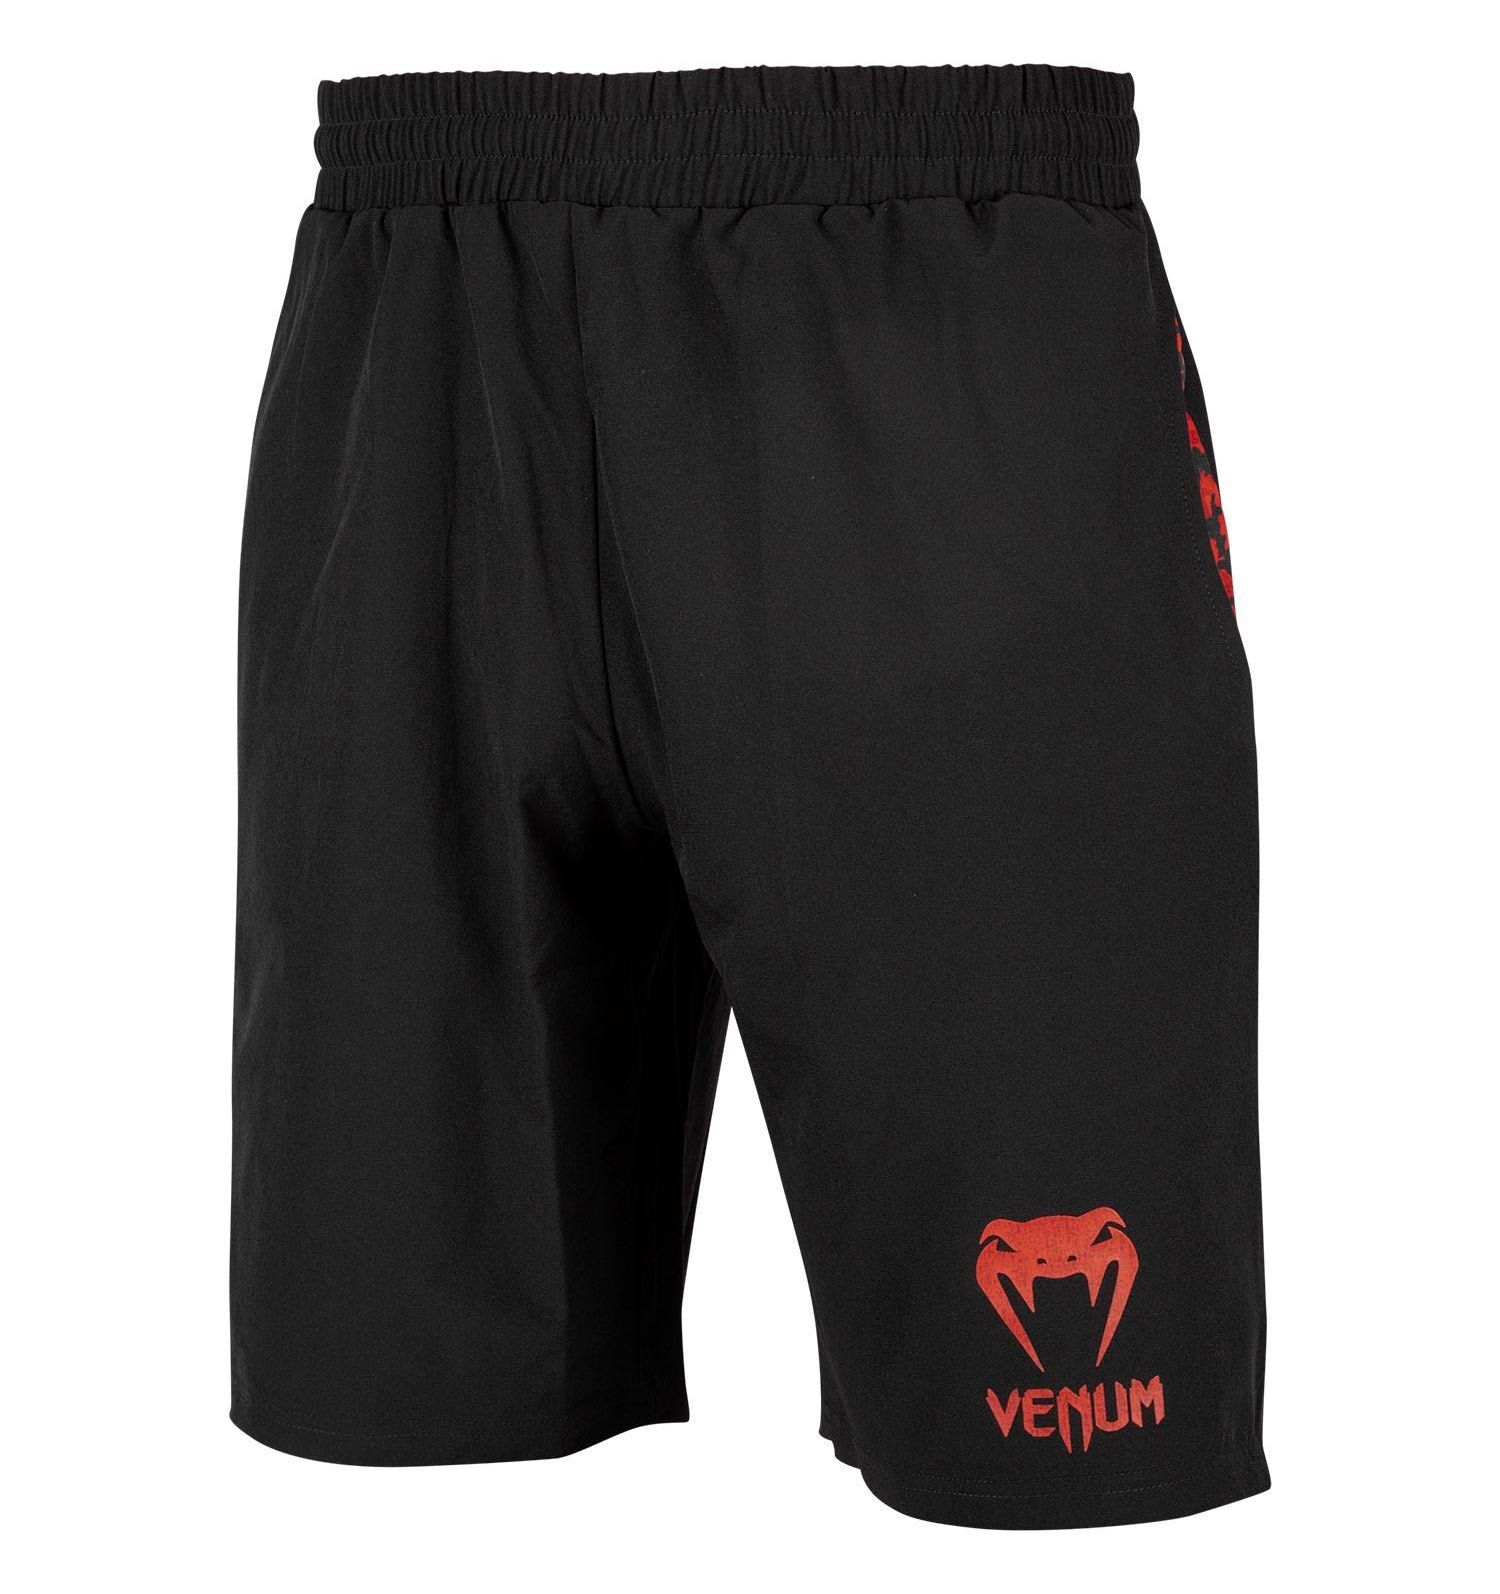 Black//Khaki Venum Signature Training Shorts